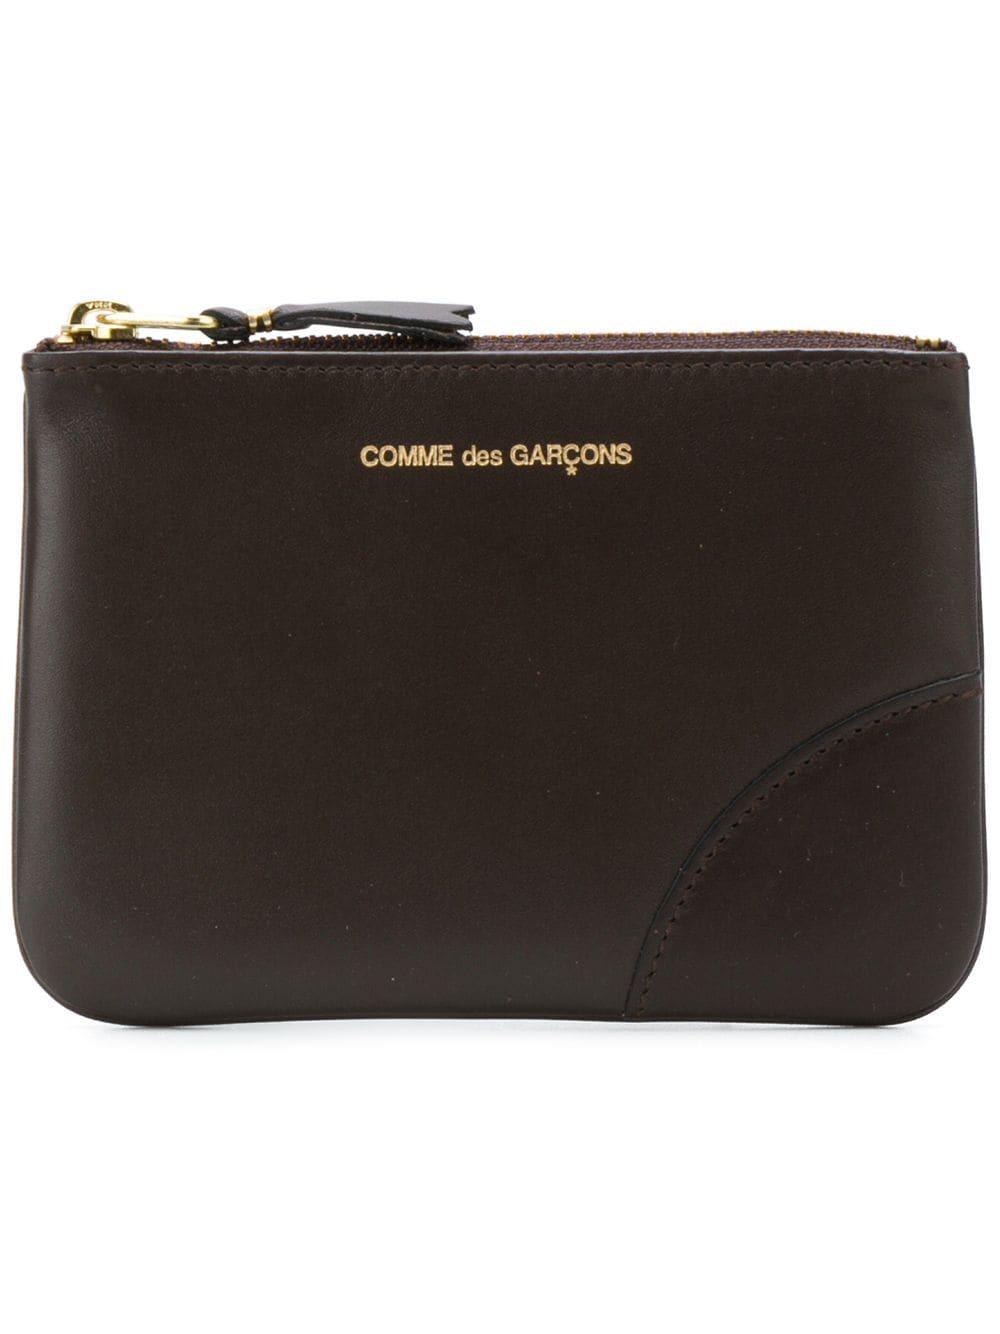 portafoglio con logo unisex marrone in pelle COMME DES GARÇONS WALLET | Portafogli | SA8100801